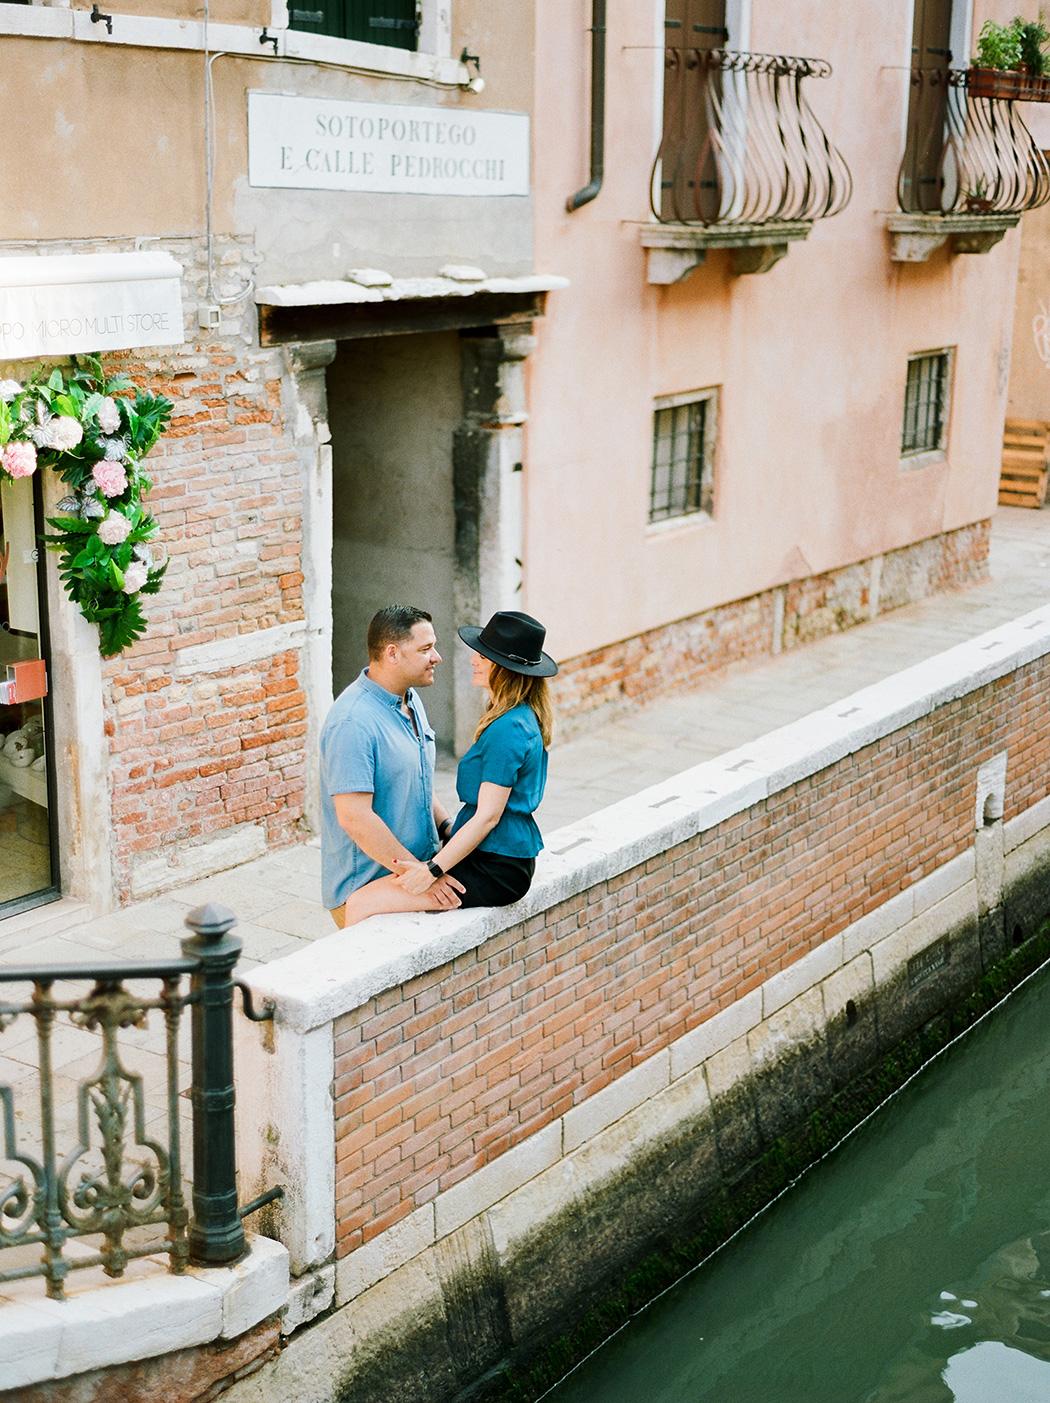 037S&E_Venice.jpg